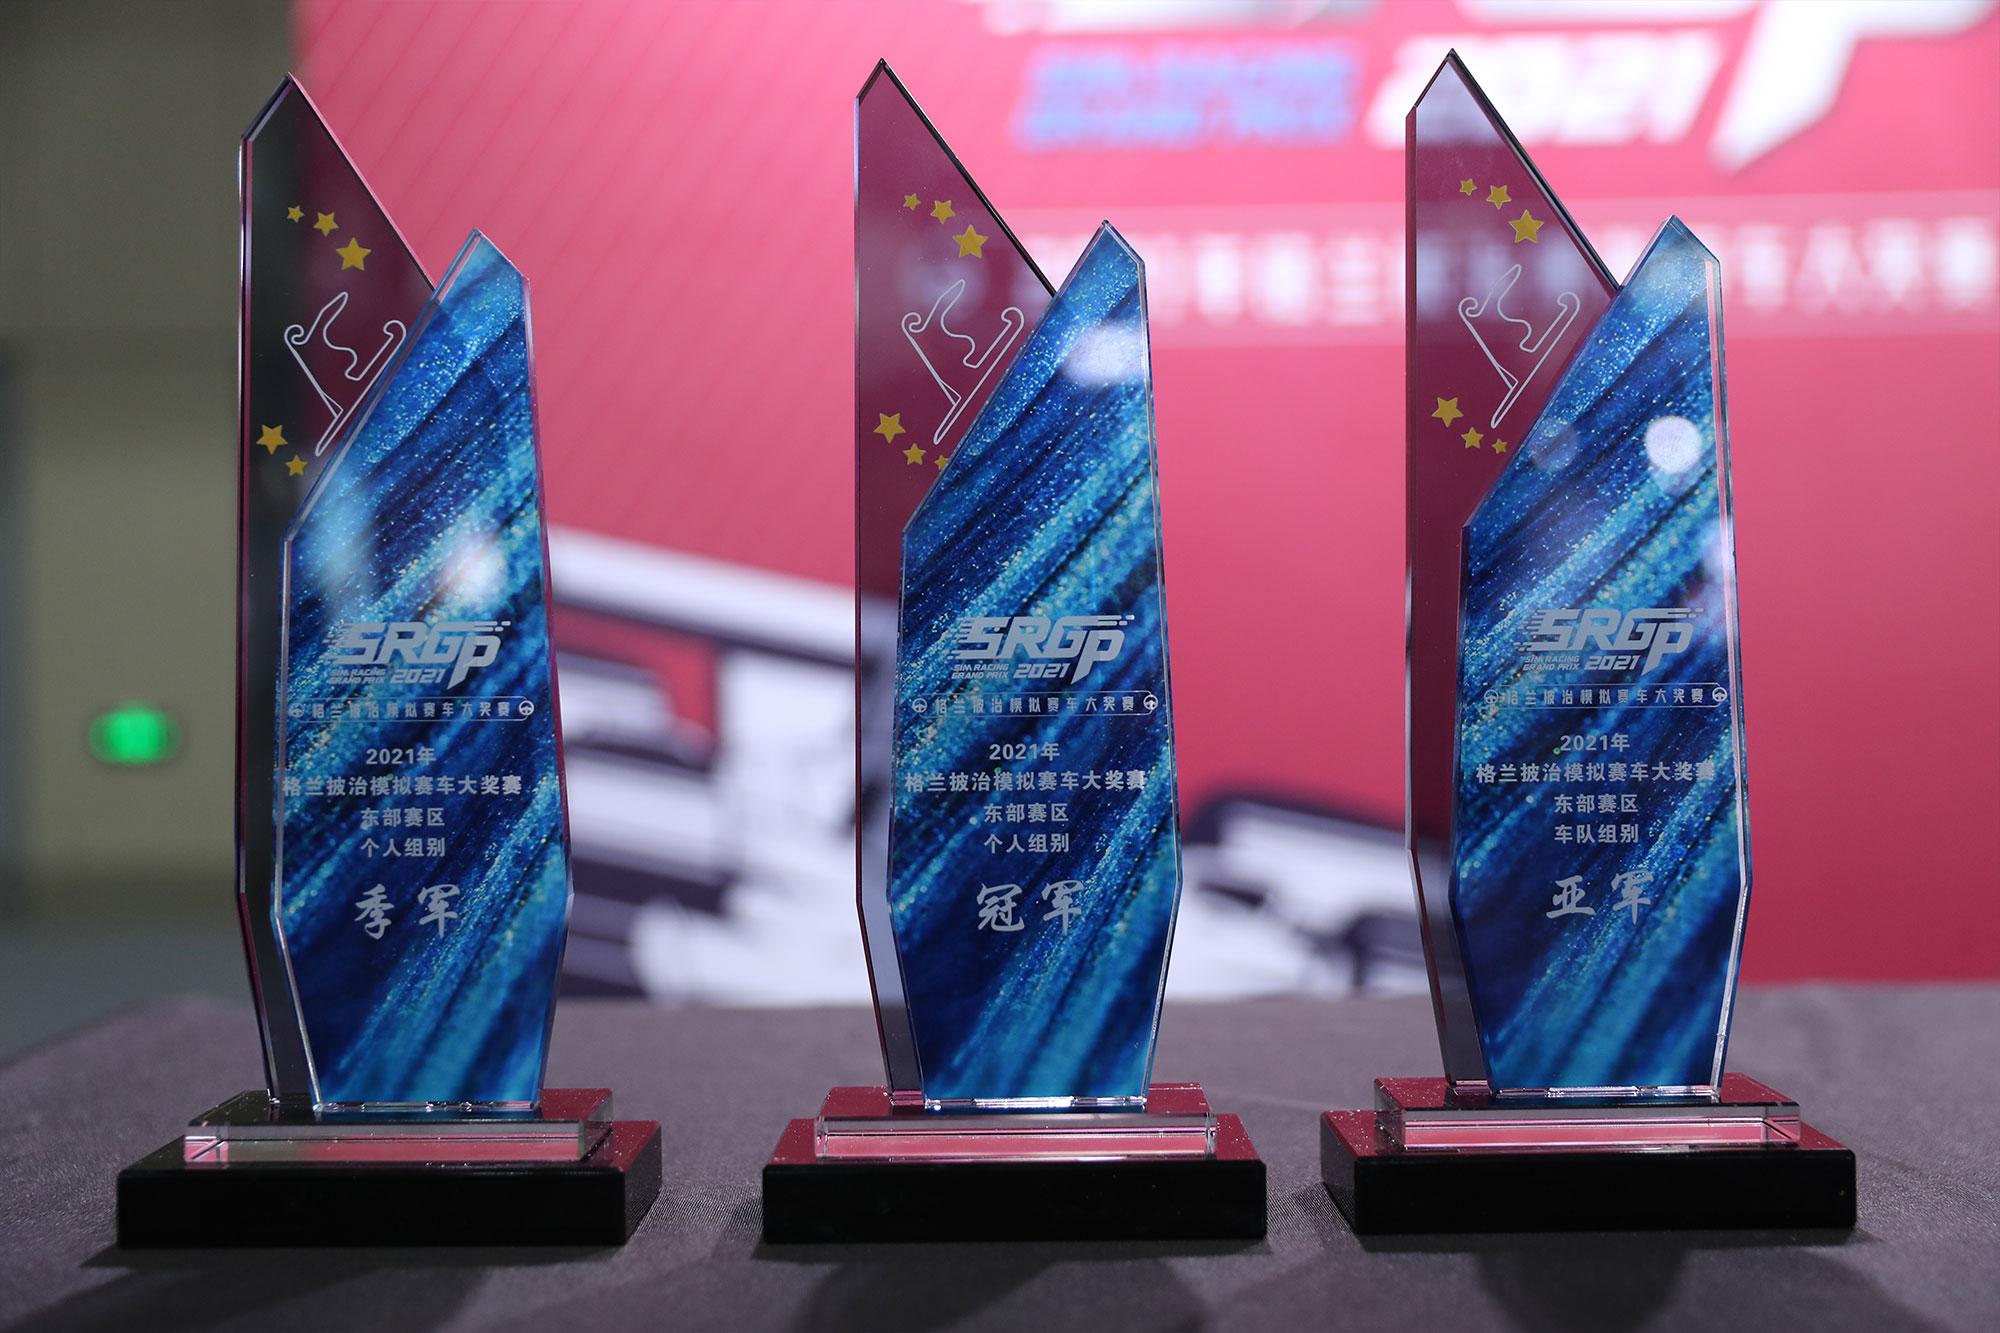 2021SRGP南京站第三天比赛集锦